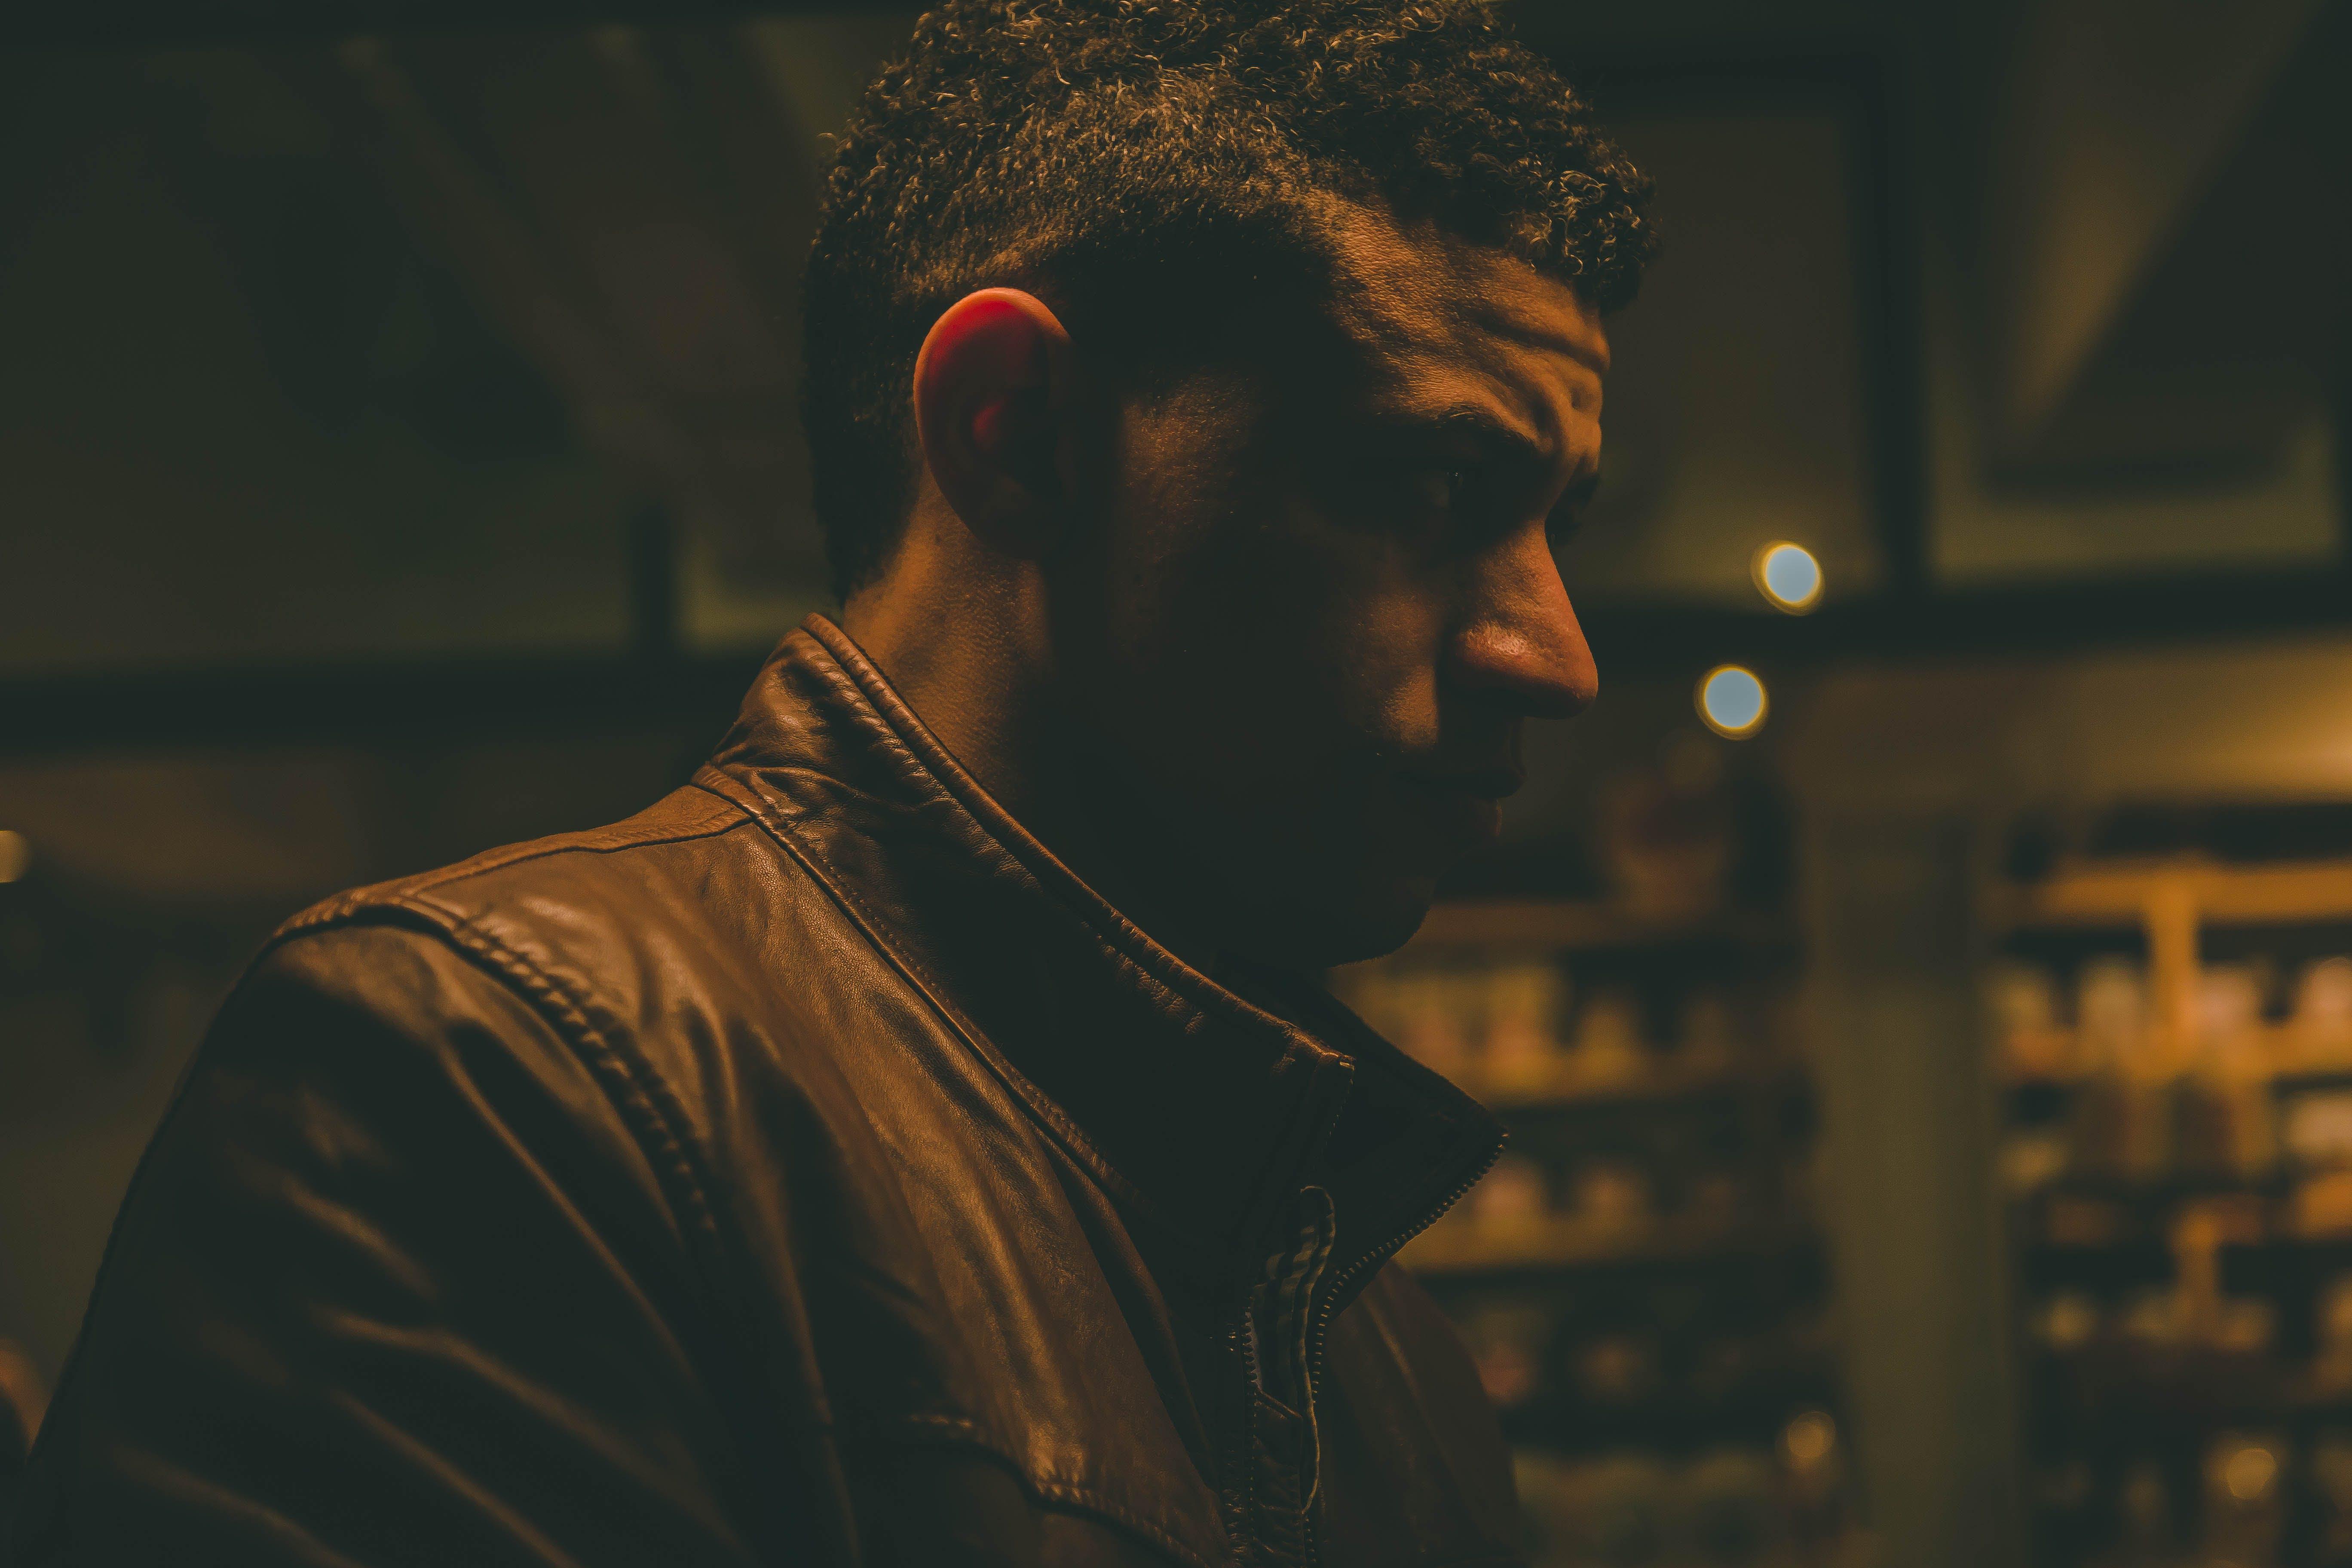 Close-Up Photo of Man Wearing Leather Jacket